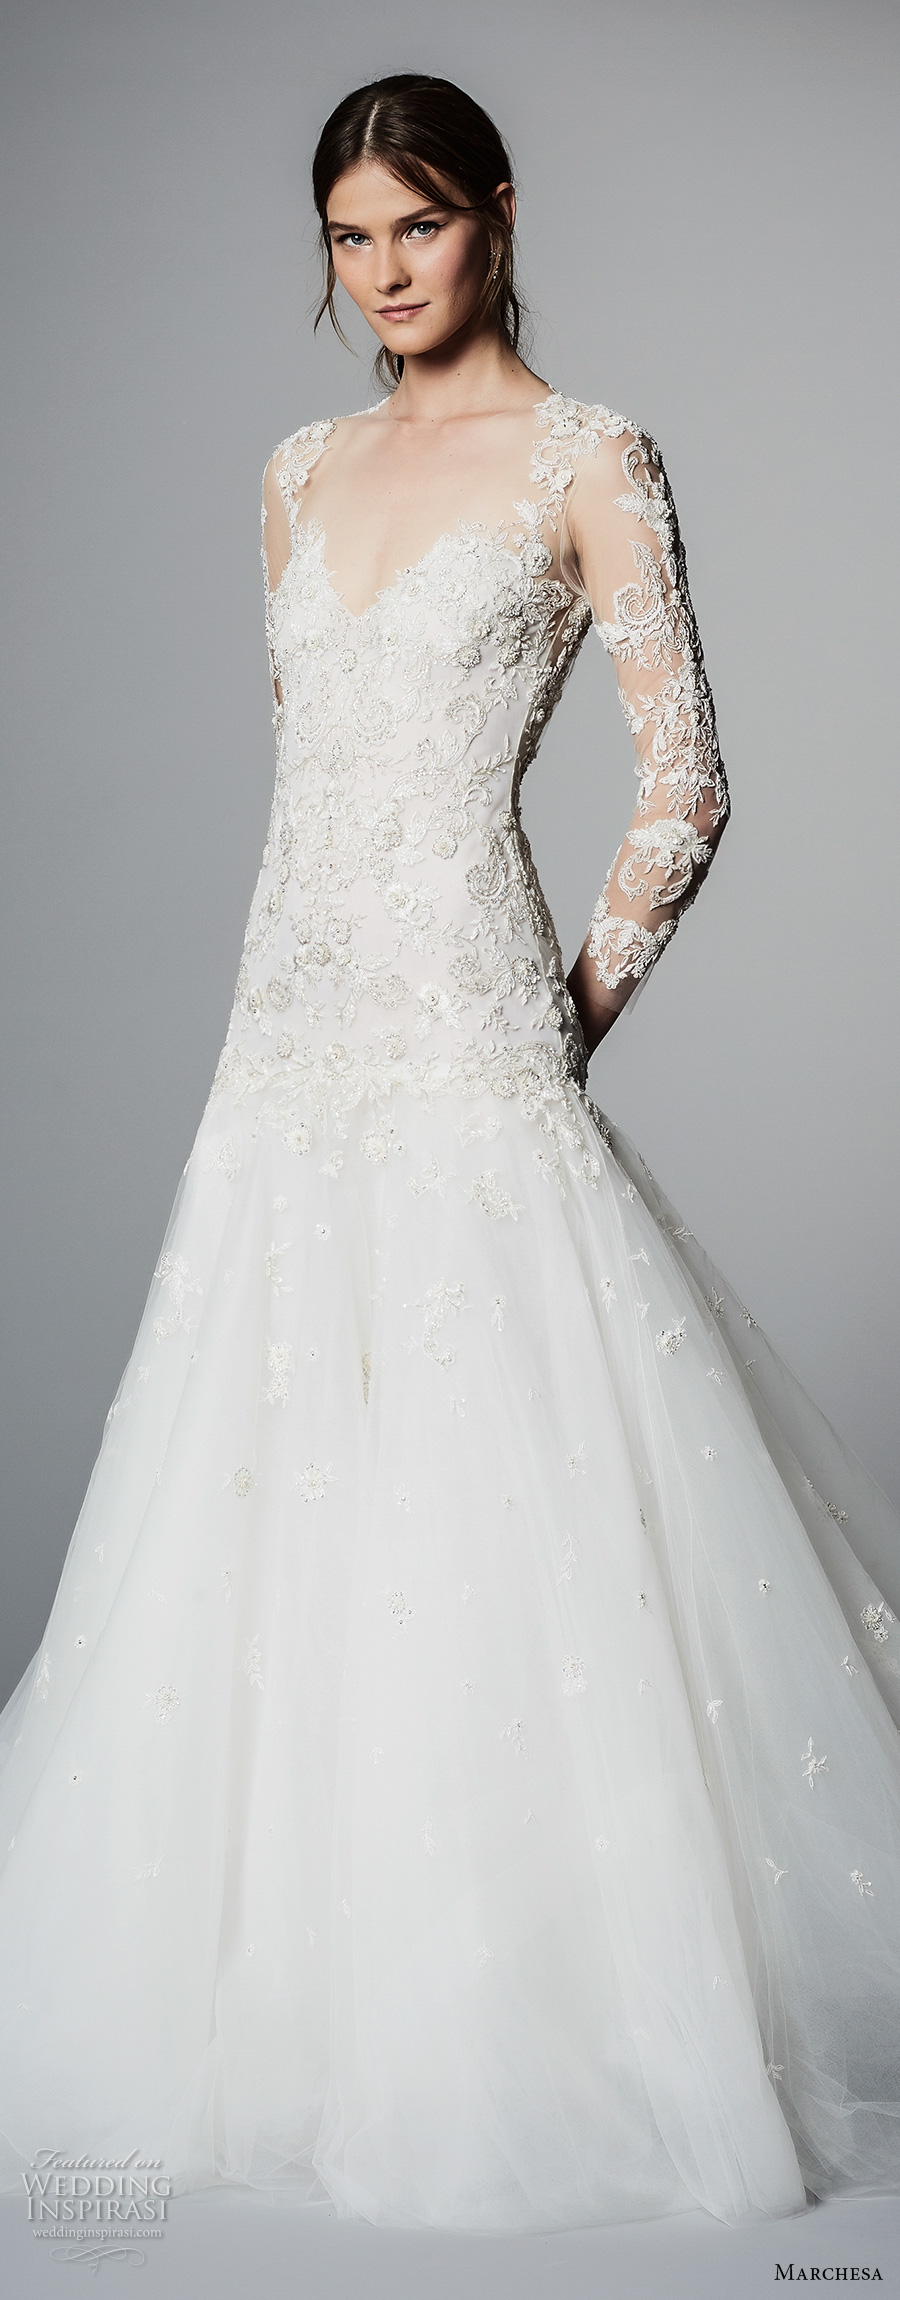 marchesa spring 2018 bridal long sleeves sweetheart neckline heavily embellished bodice glamorous romantic a  line wedding dress open low back chapel train (08) zv